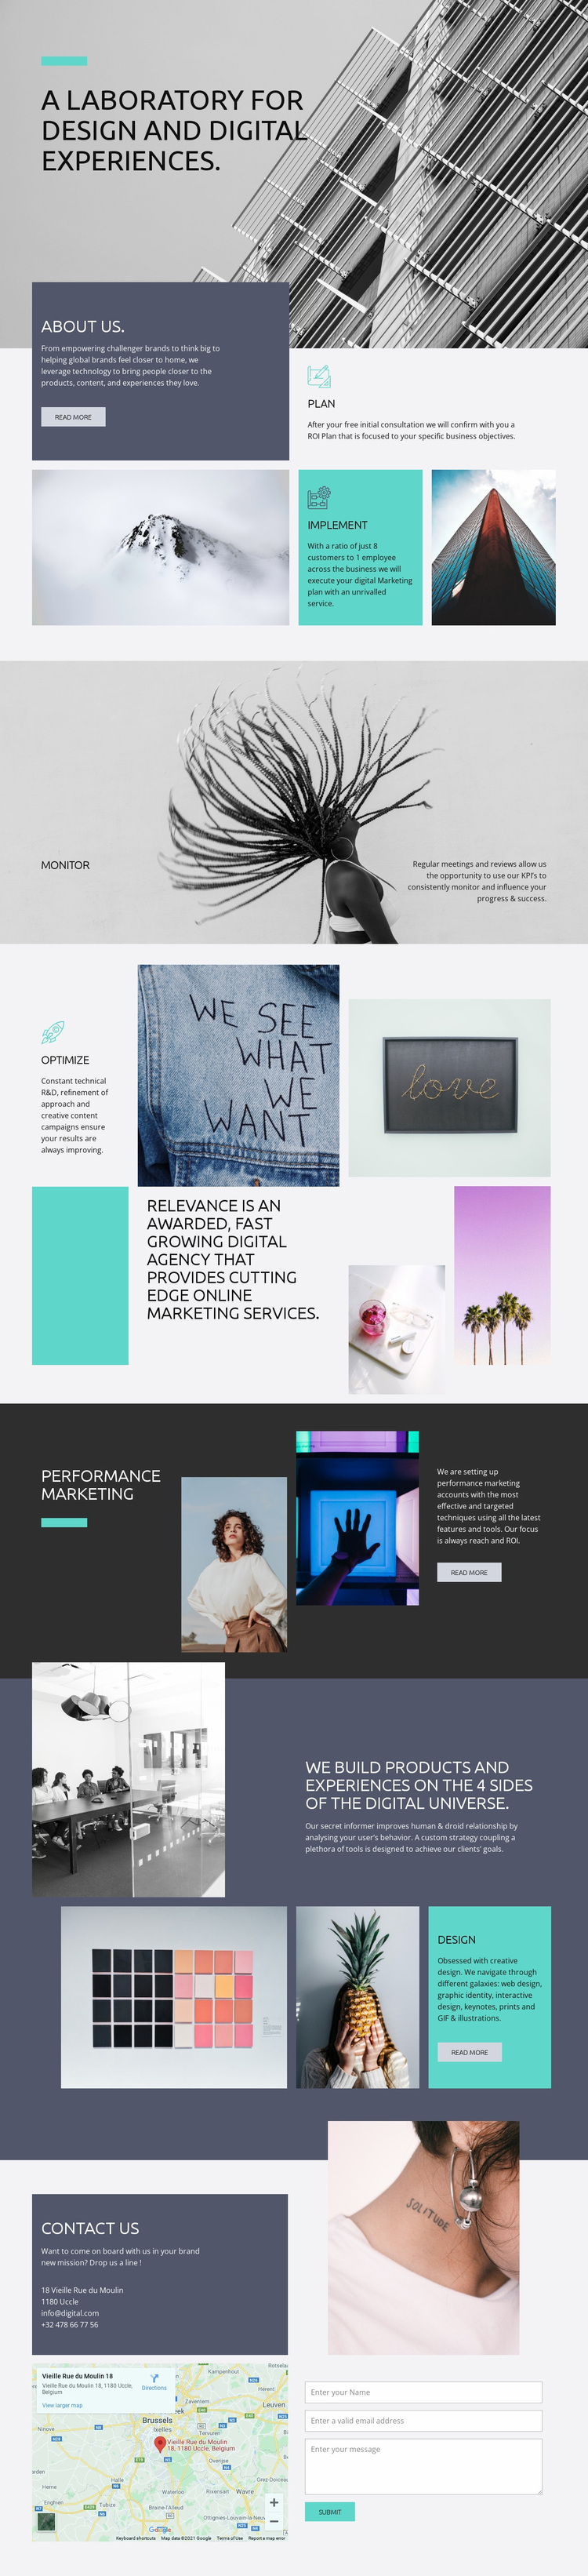 Creative lab for digital art Website Design